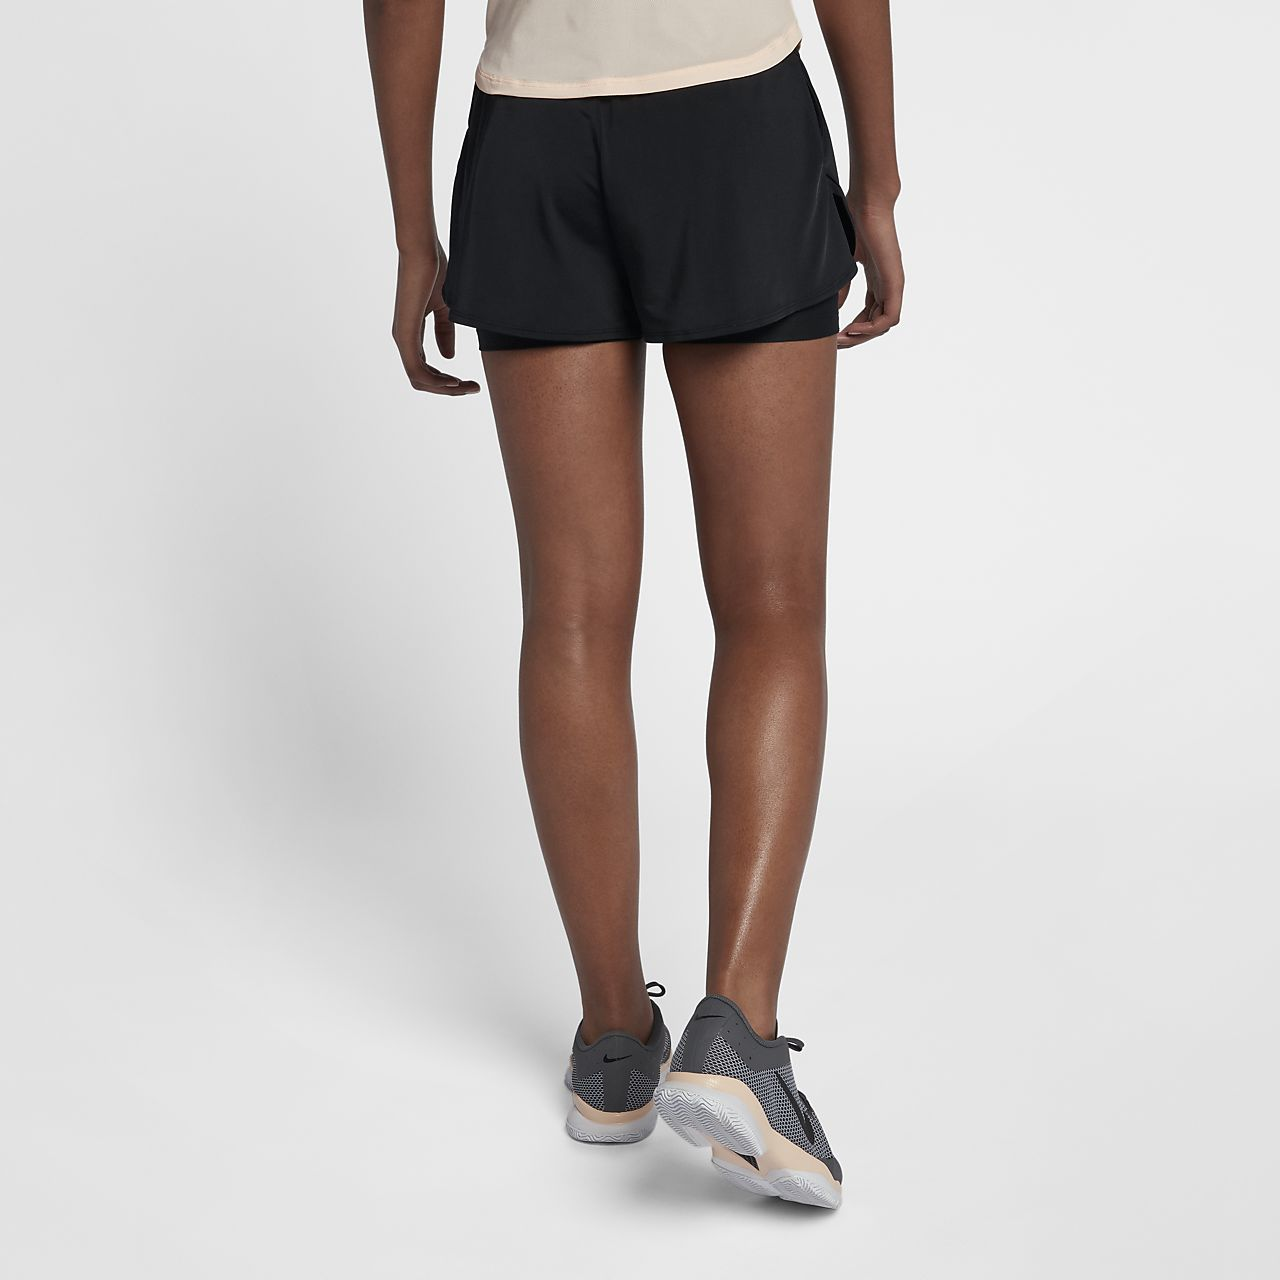 ... NikeCourt Dri-FIT Ace Women's Tennis Shorts